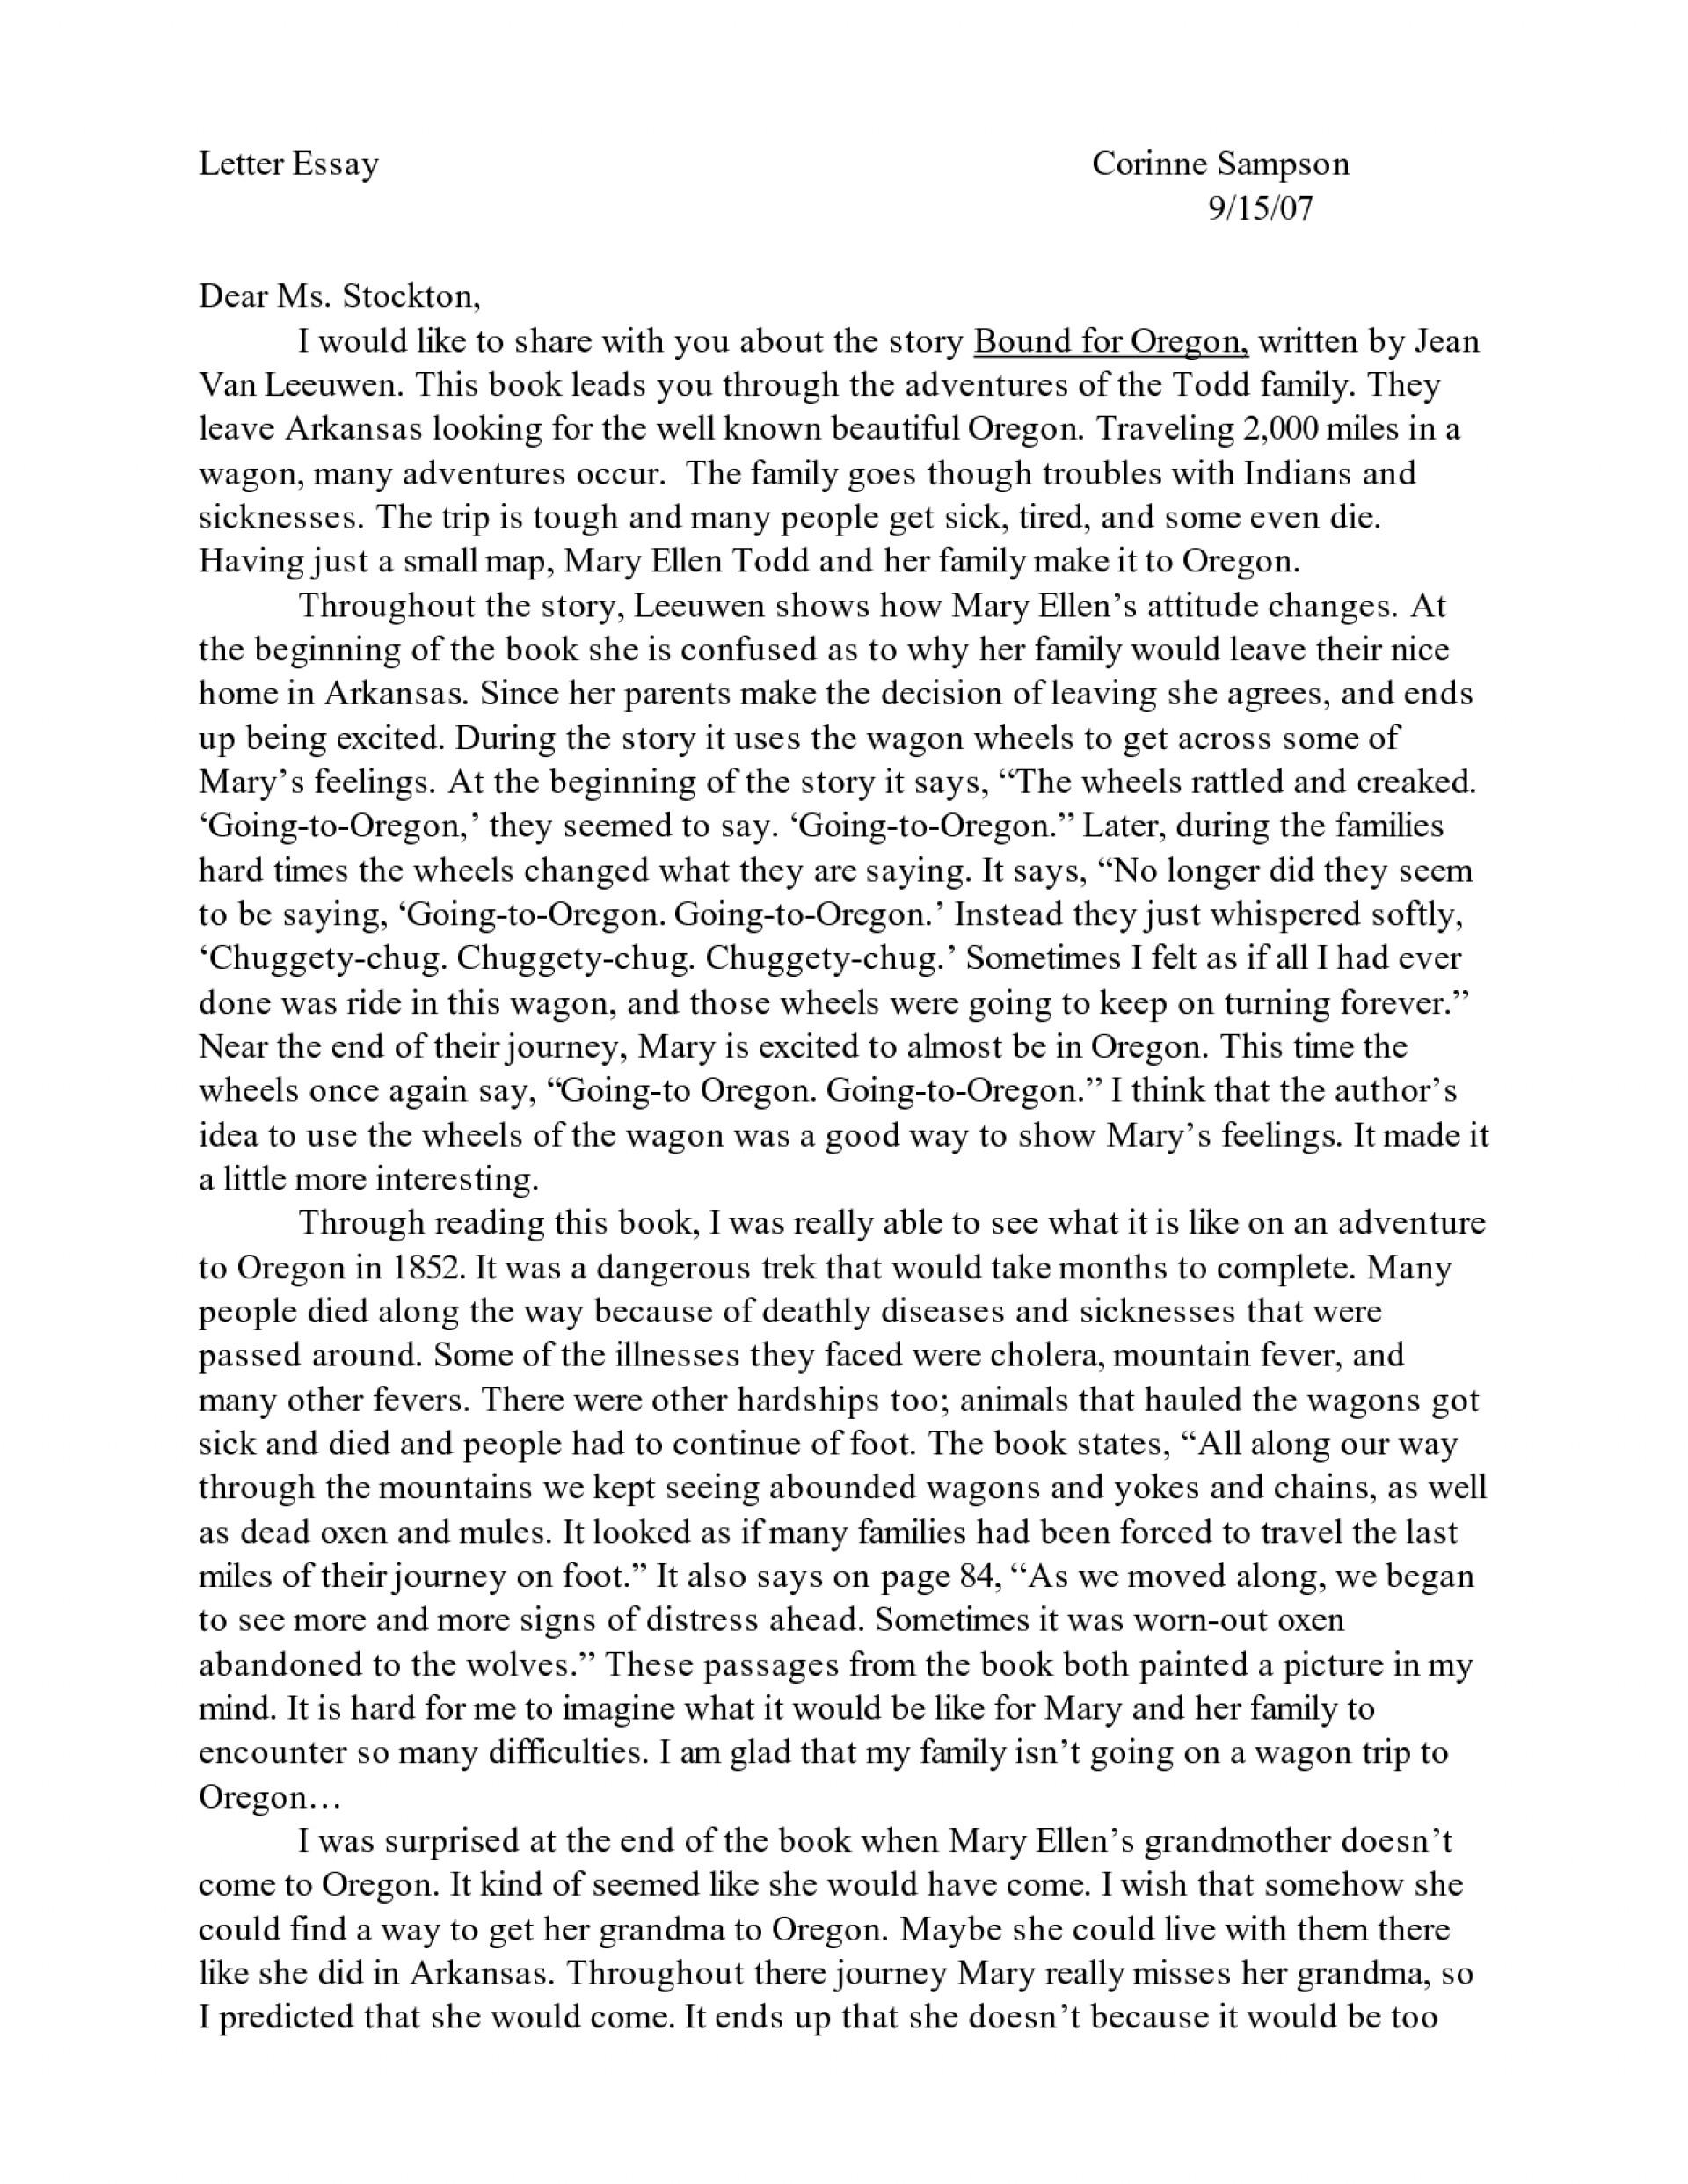 002 Example Scholarships Phenomenal Scholarship Essays Sample For Masters 500 Words Nursing 1920